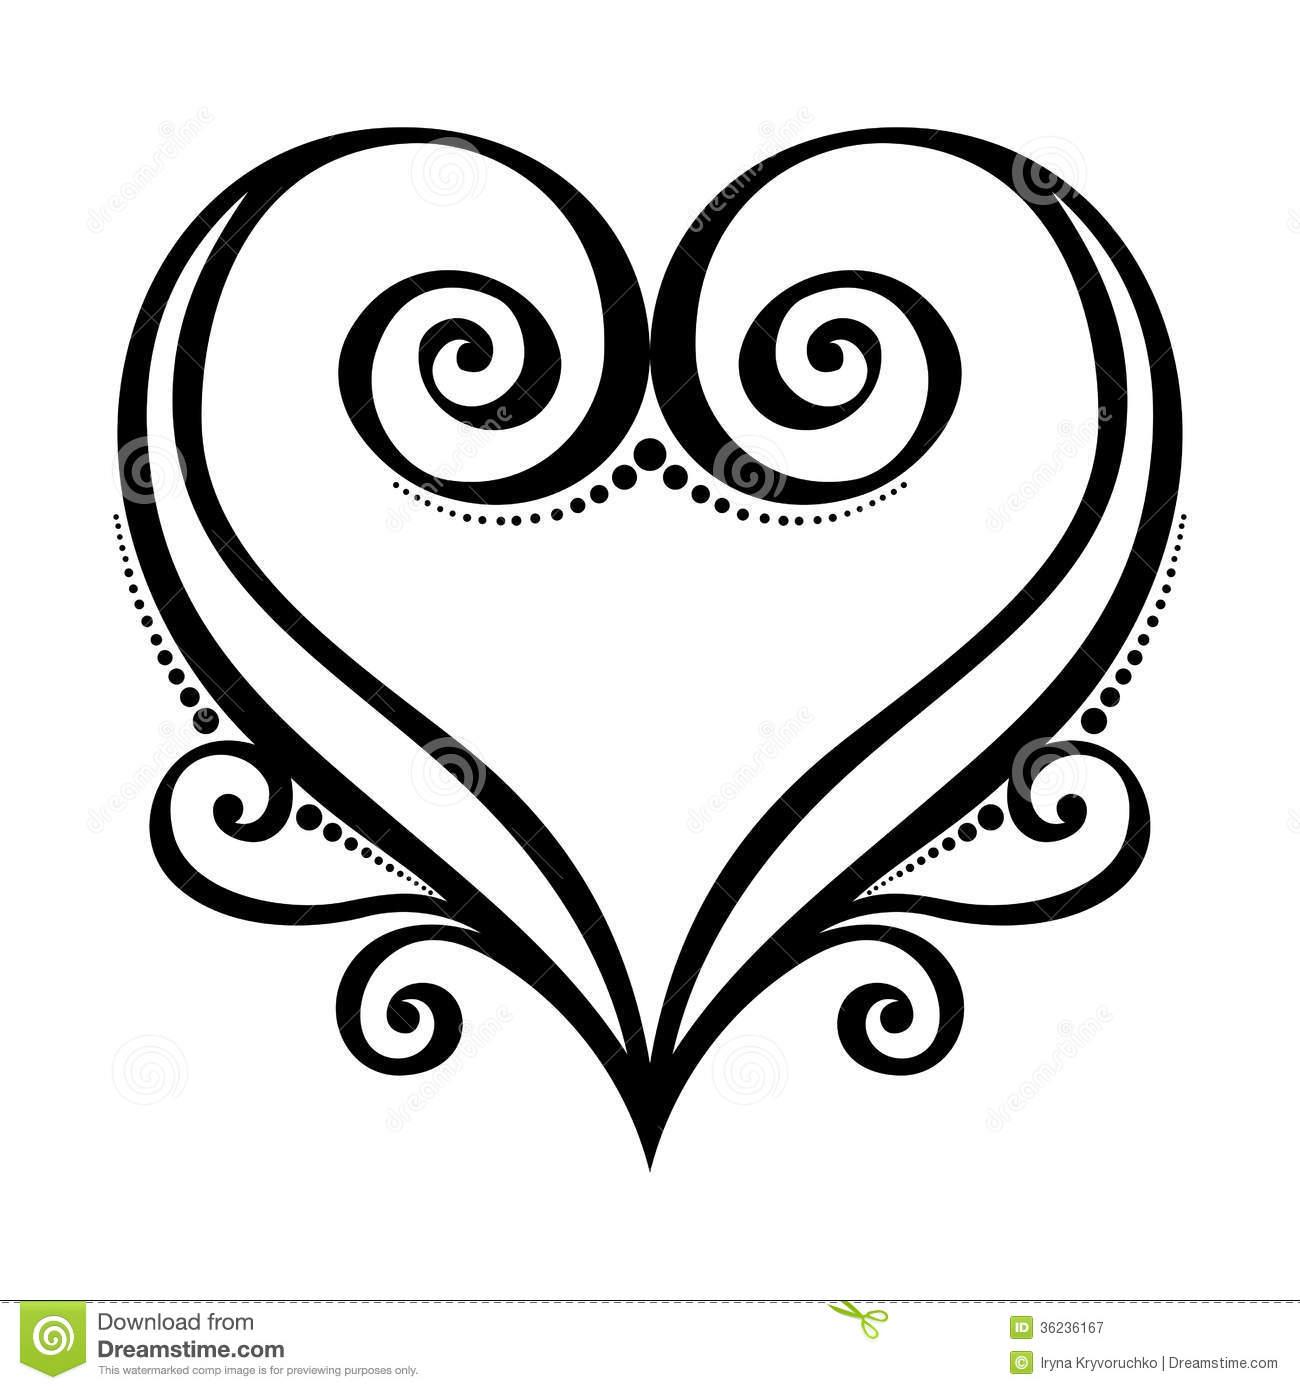 Heart Drawing Clip Art At Getdrawings